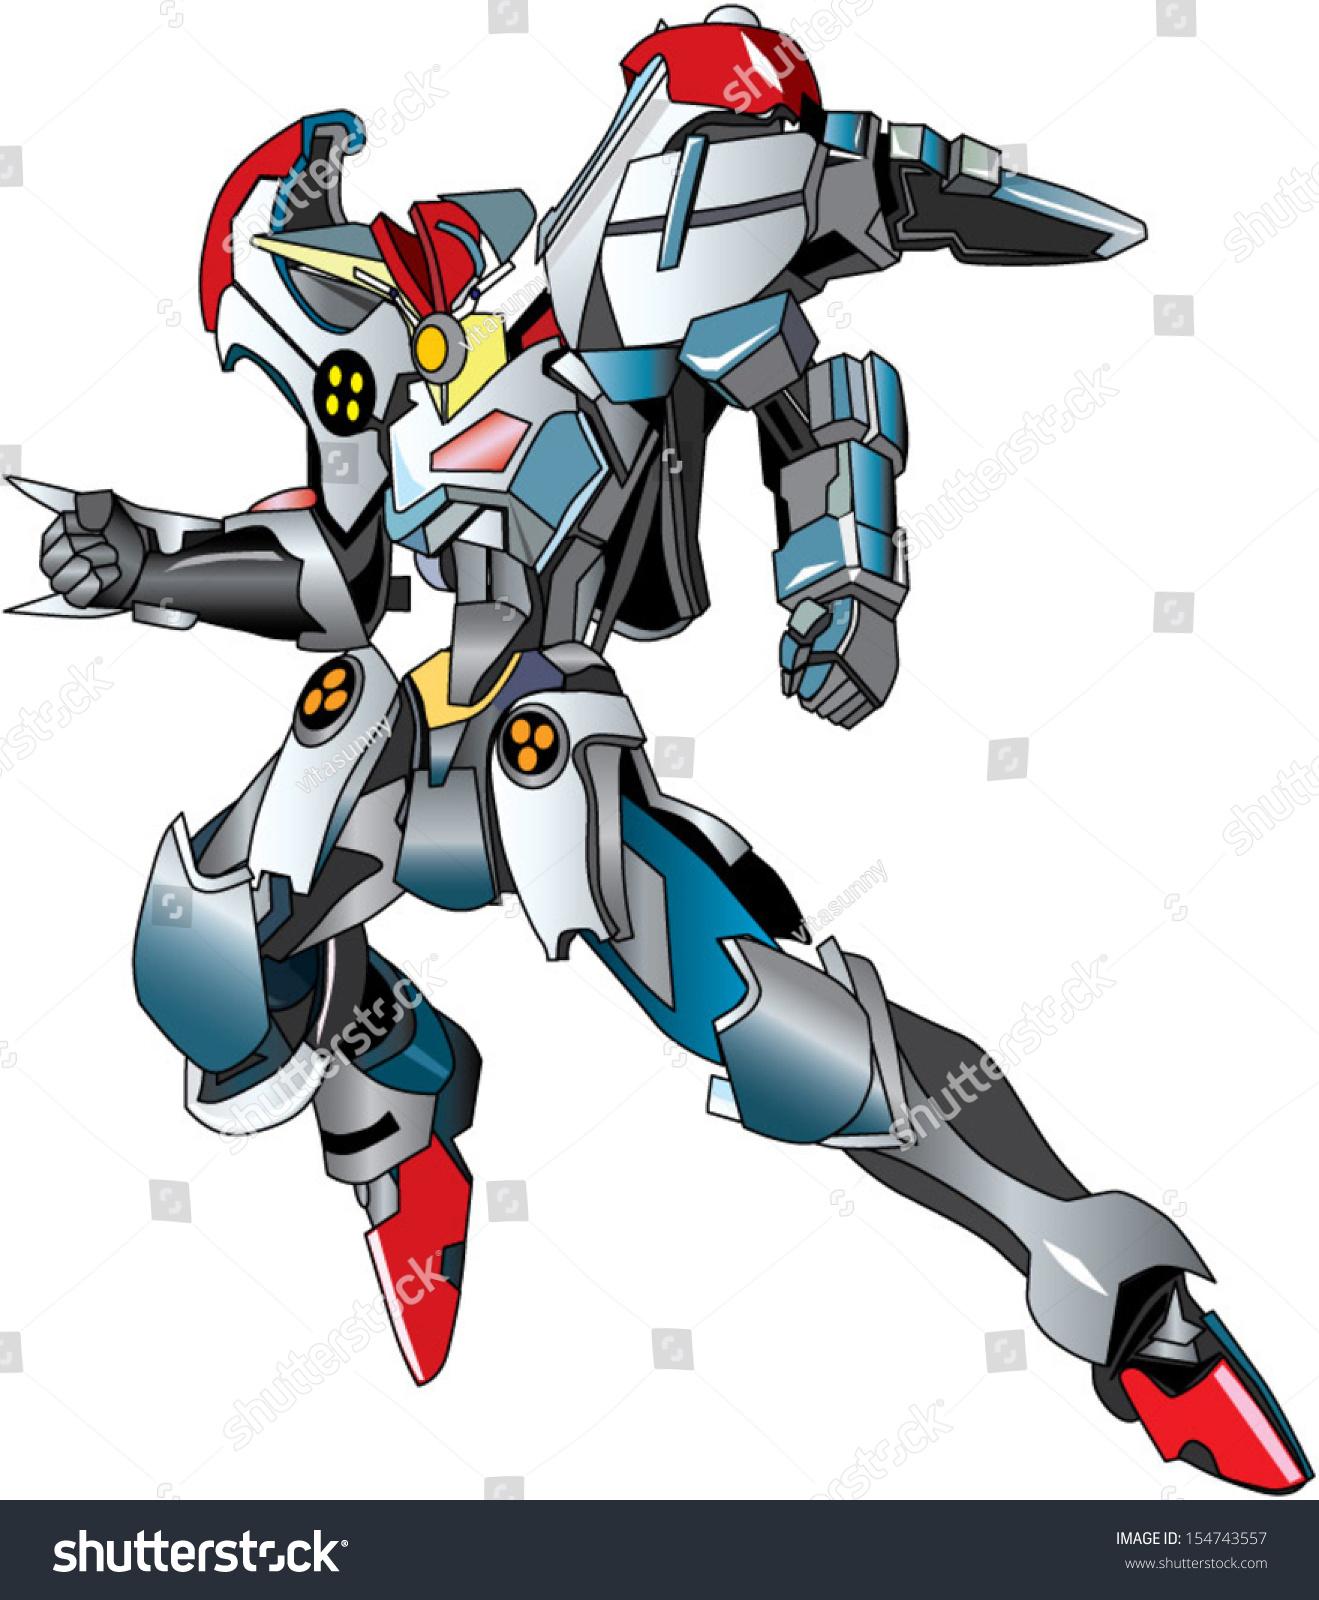 Flying cartoon robot